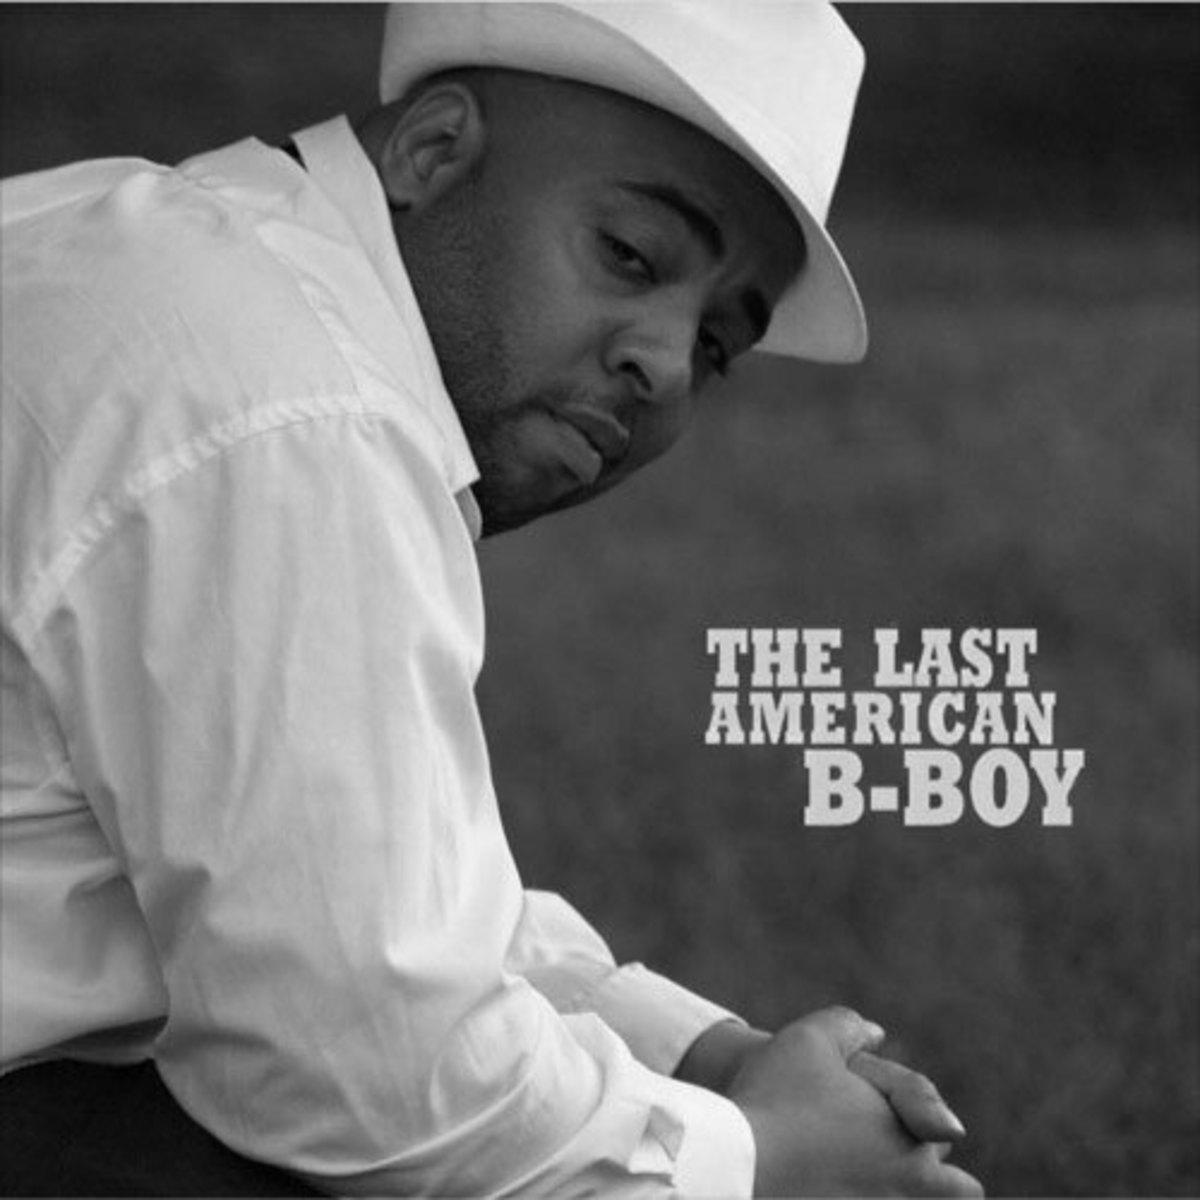 the-last-american-b-boy.jpg